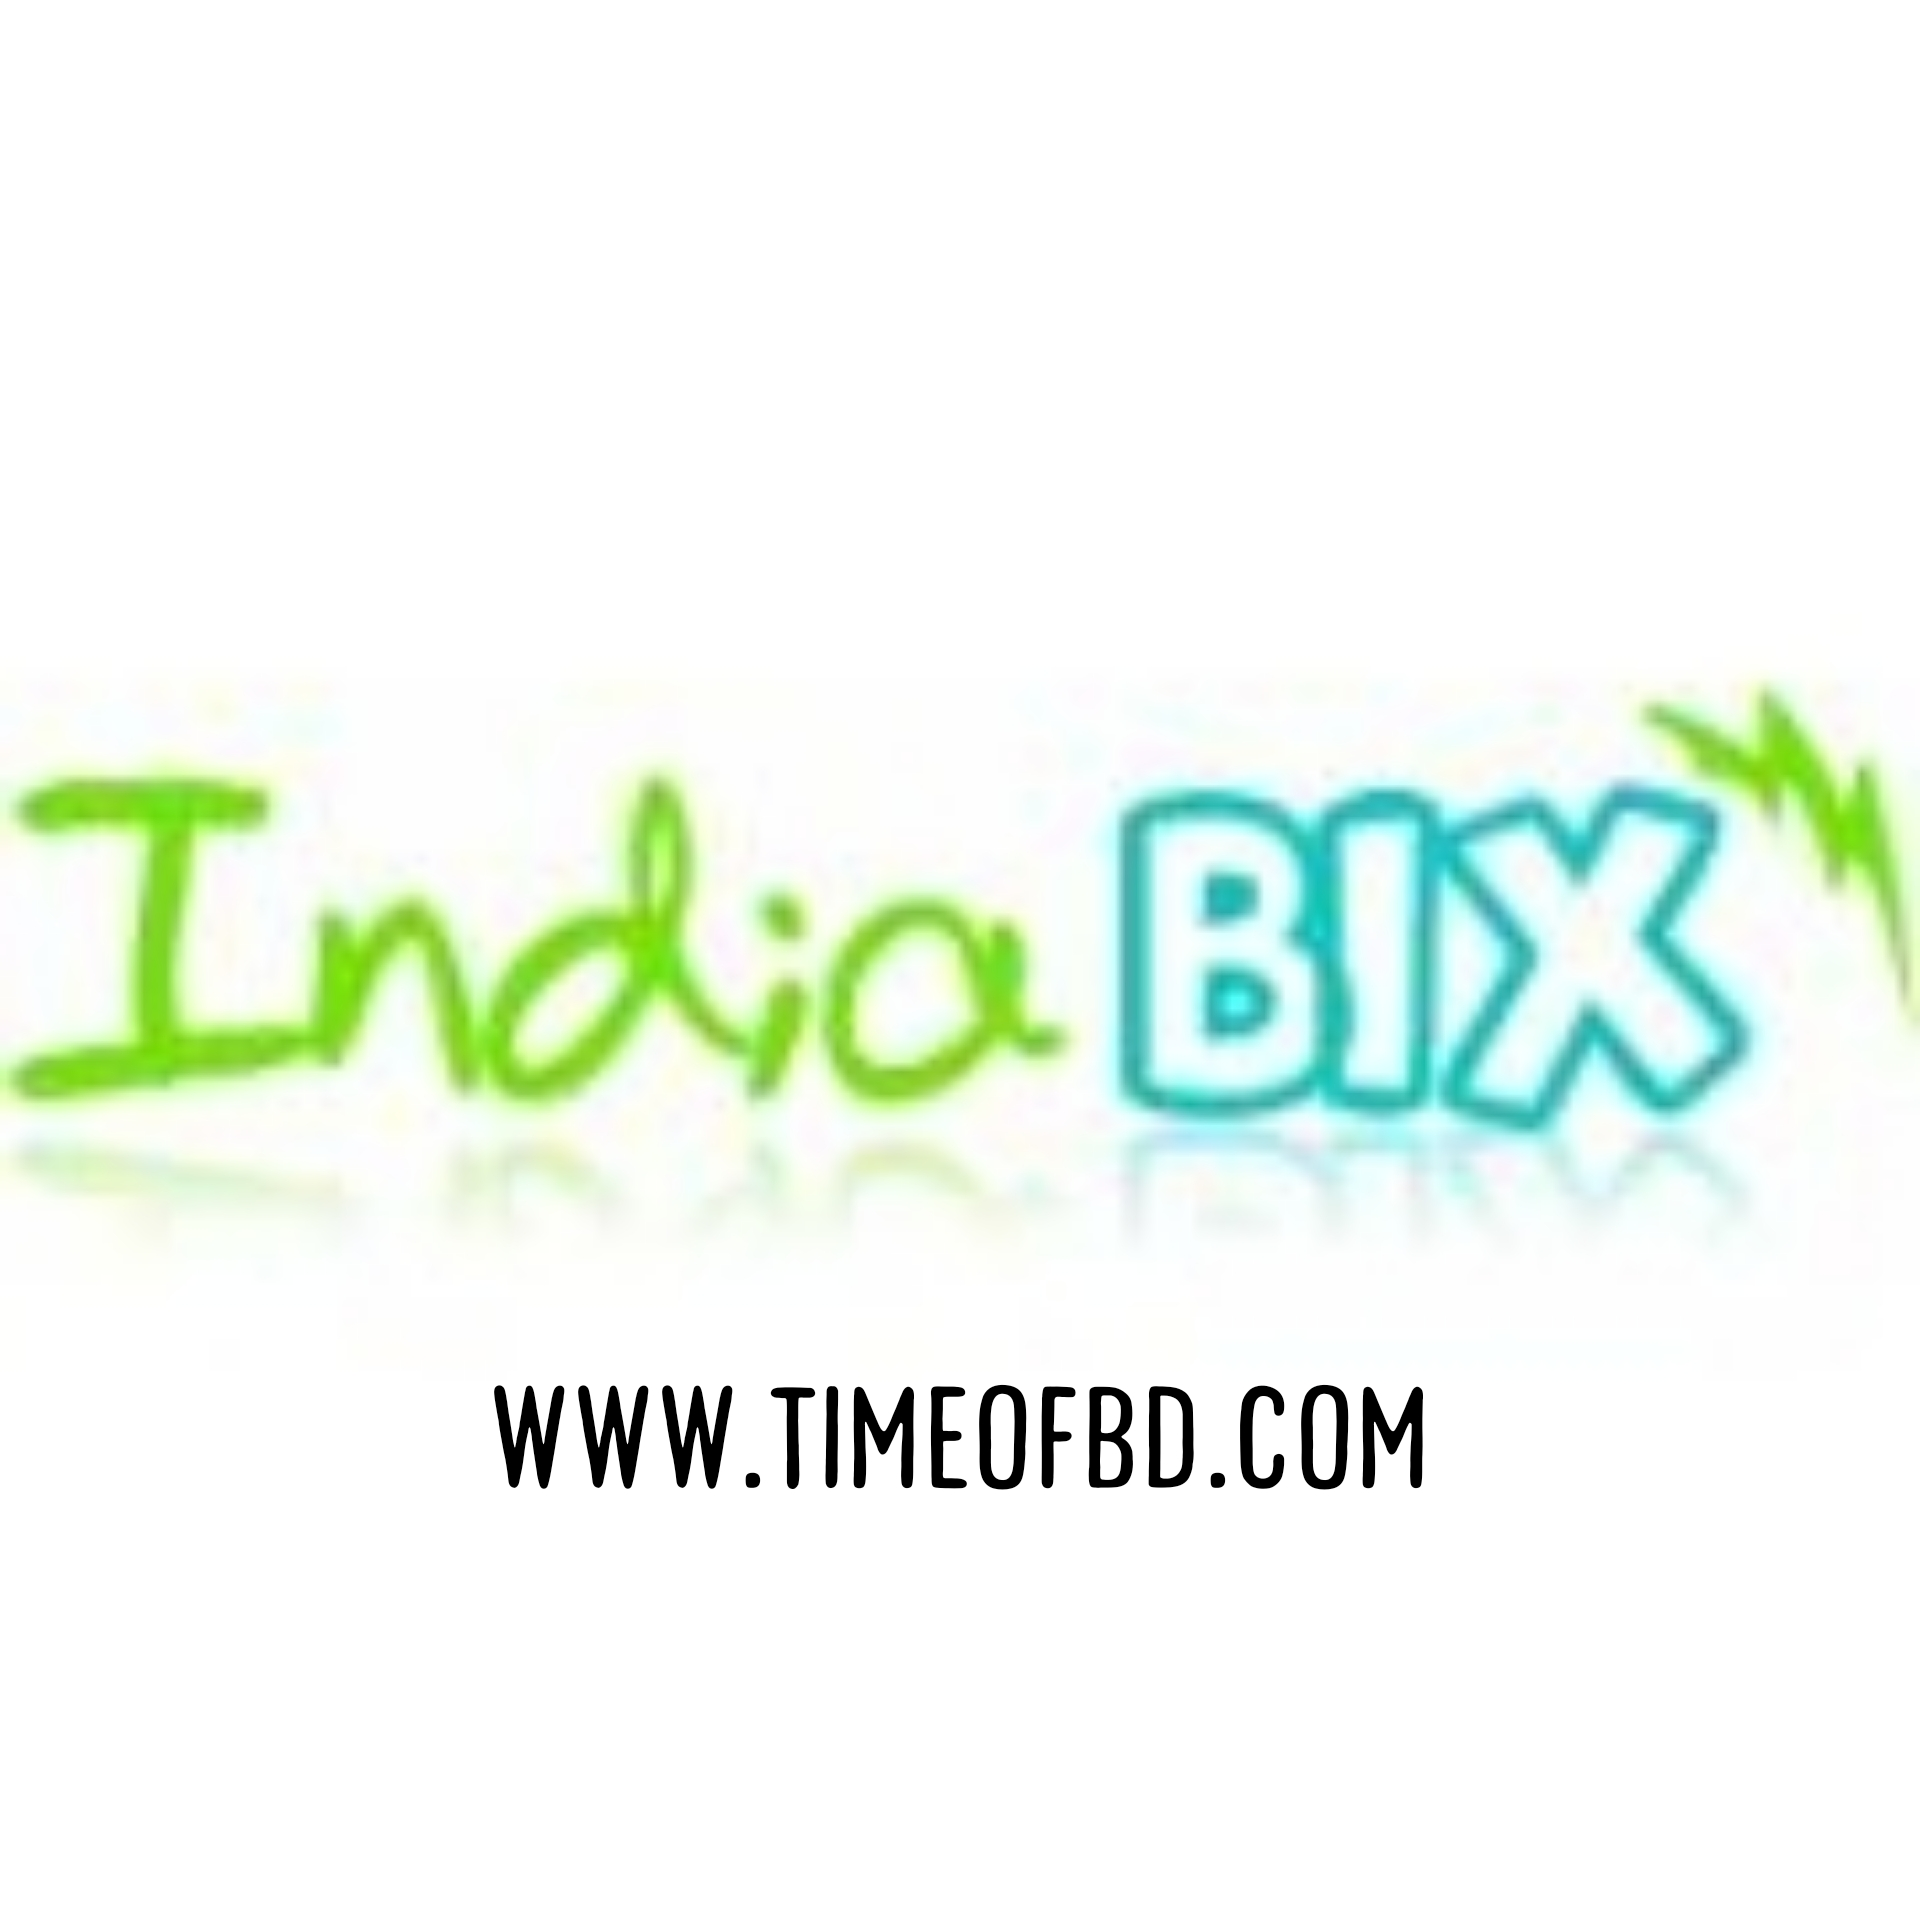 Indiabix.com english, Indiabix.com/english,Indiabix.com english website link,Indiabix.com english website, Indiabix.comwebsite link